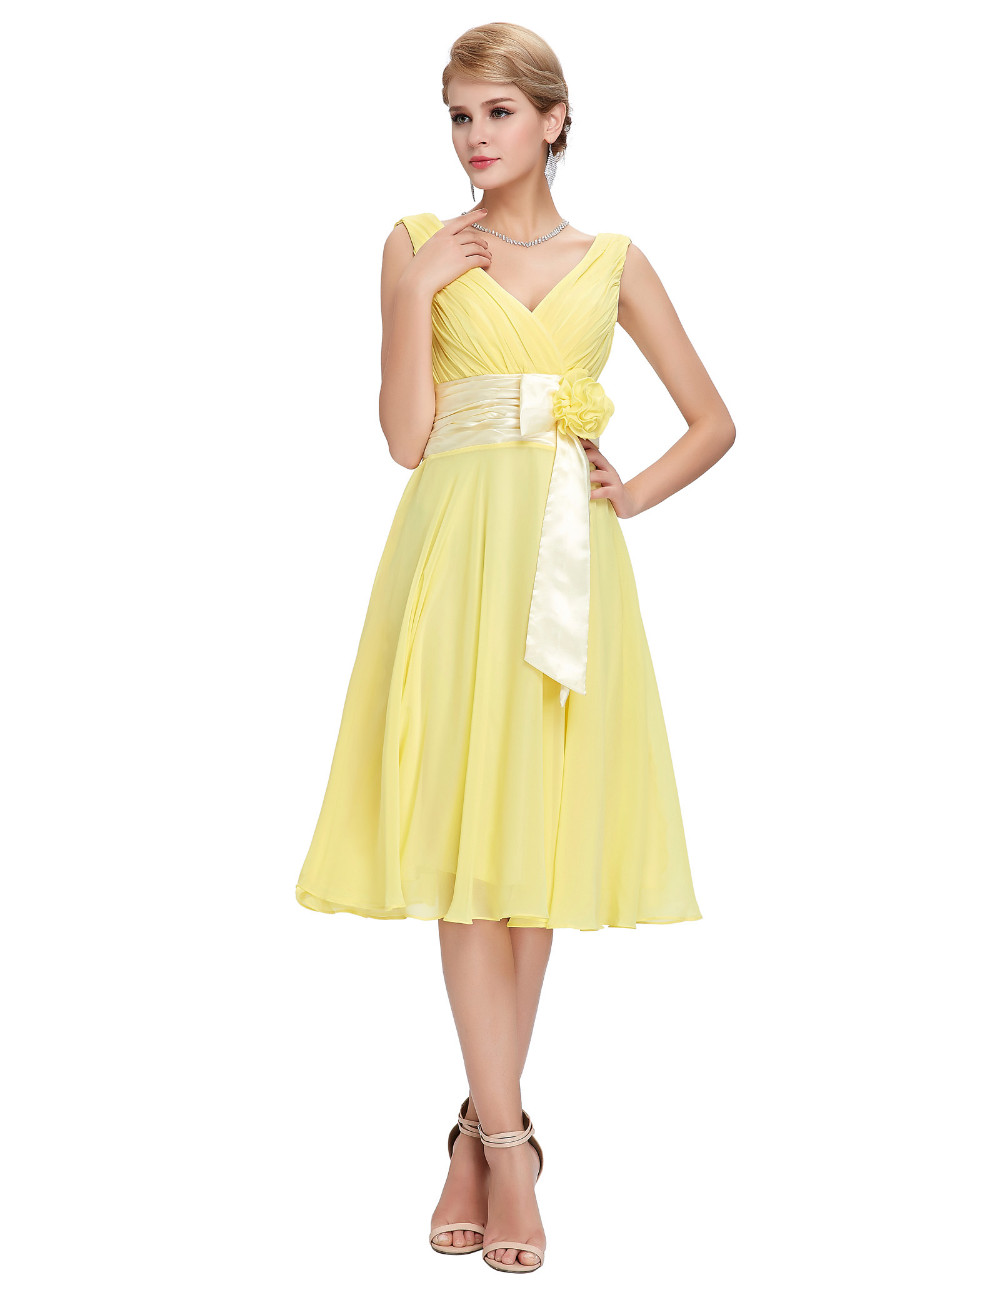 HTB1482TMVXXXXb.XVXXq6xXFXXXZKnee Length Short Chiffon Blue Dress